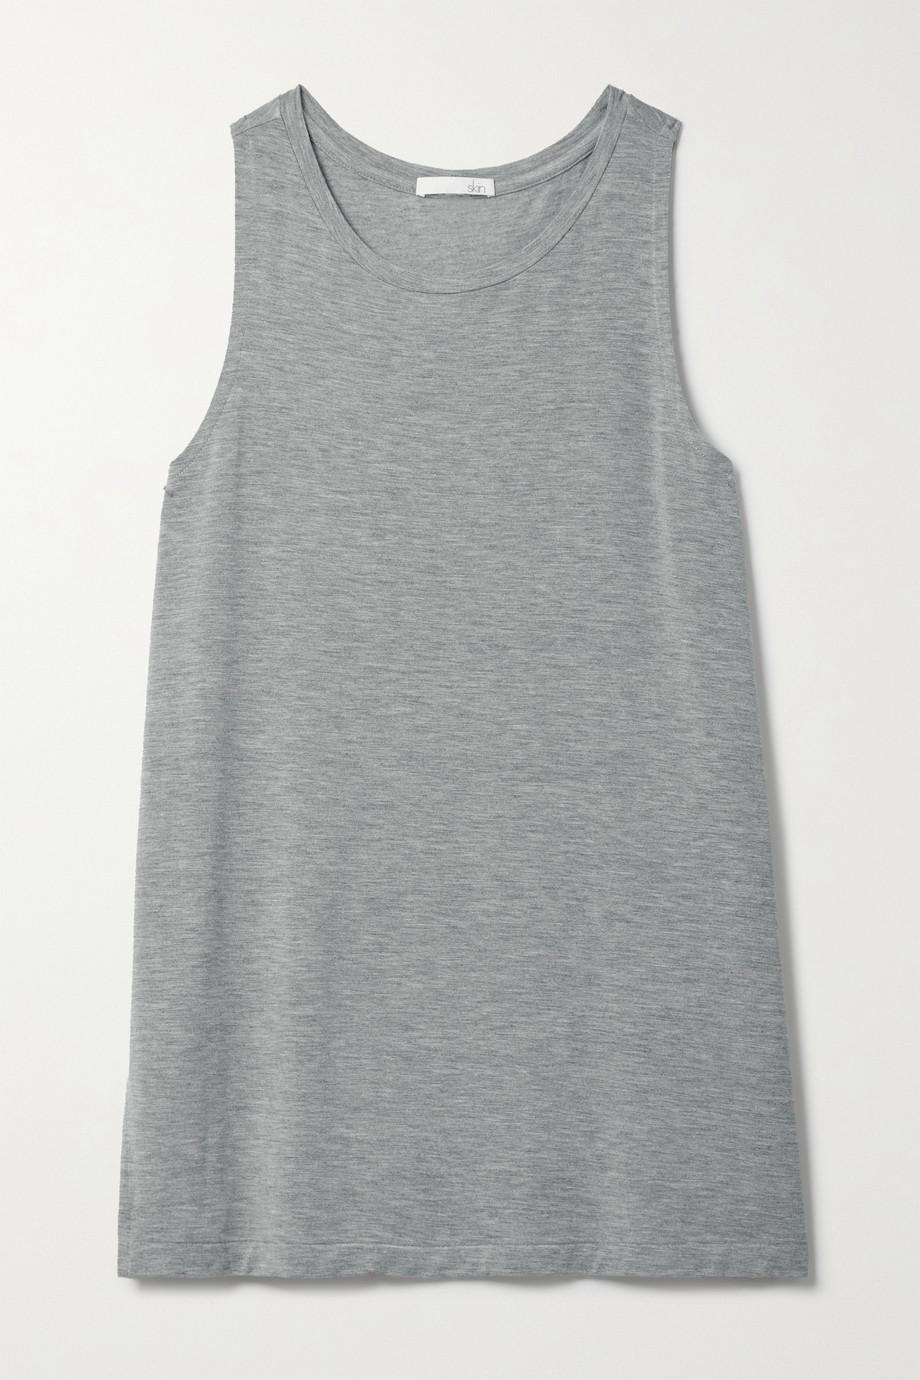 Skin Linor mélange stretch-jersey tank